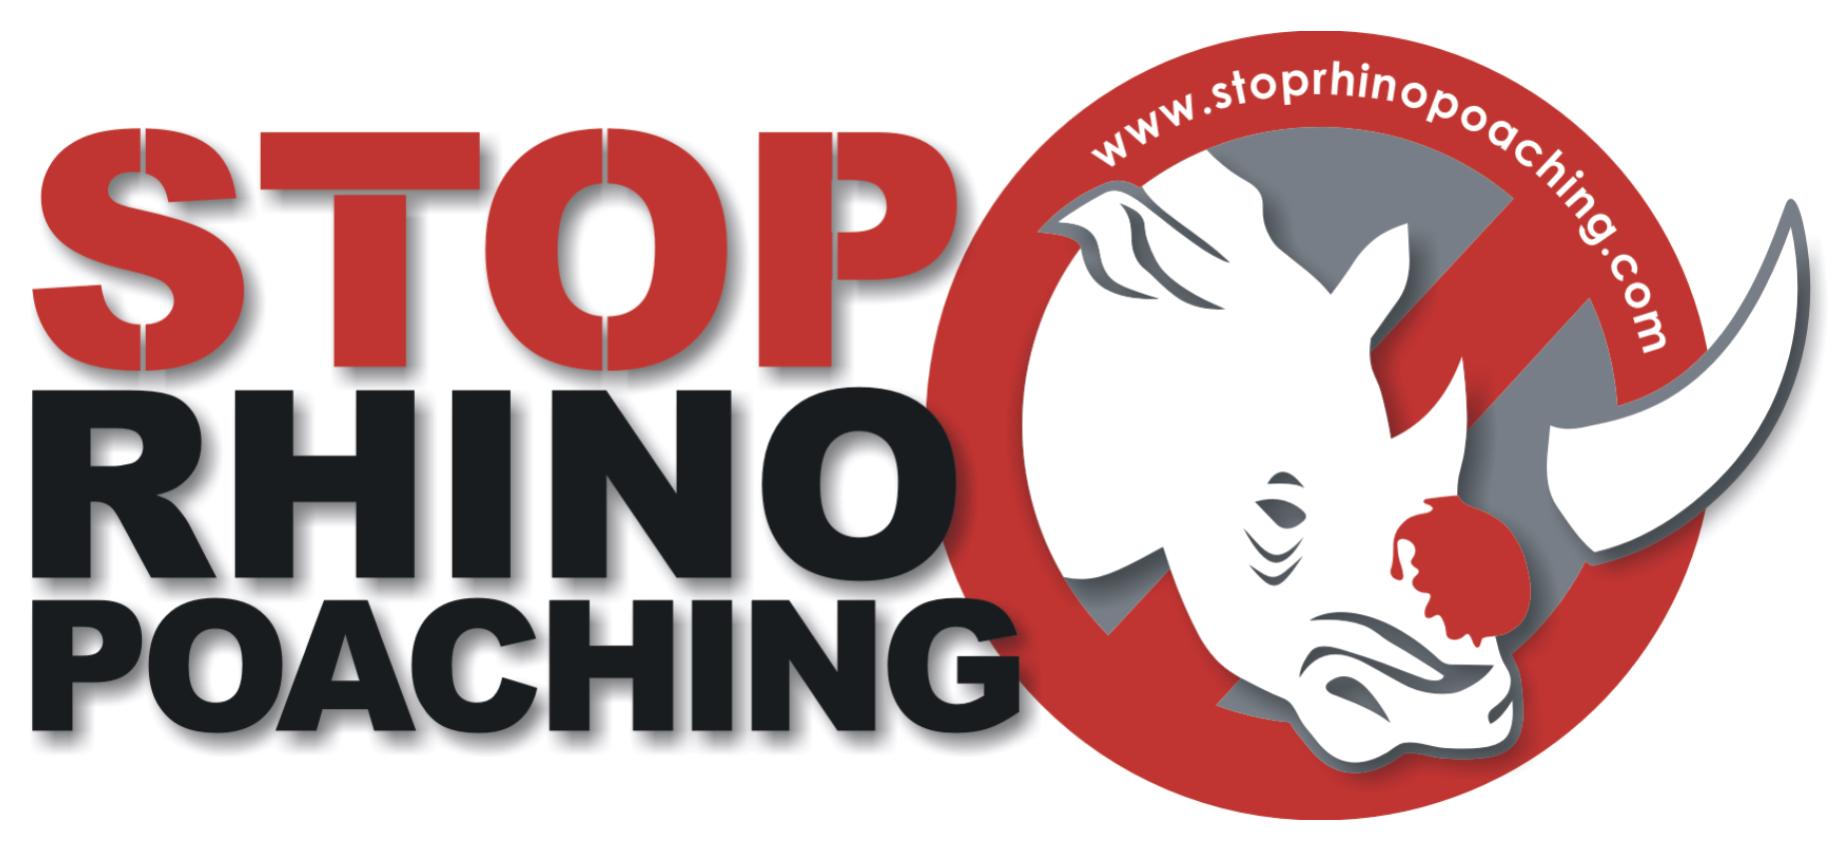 StopRhinoPoachingPetition.png